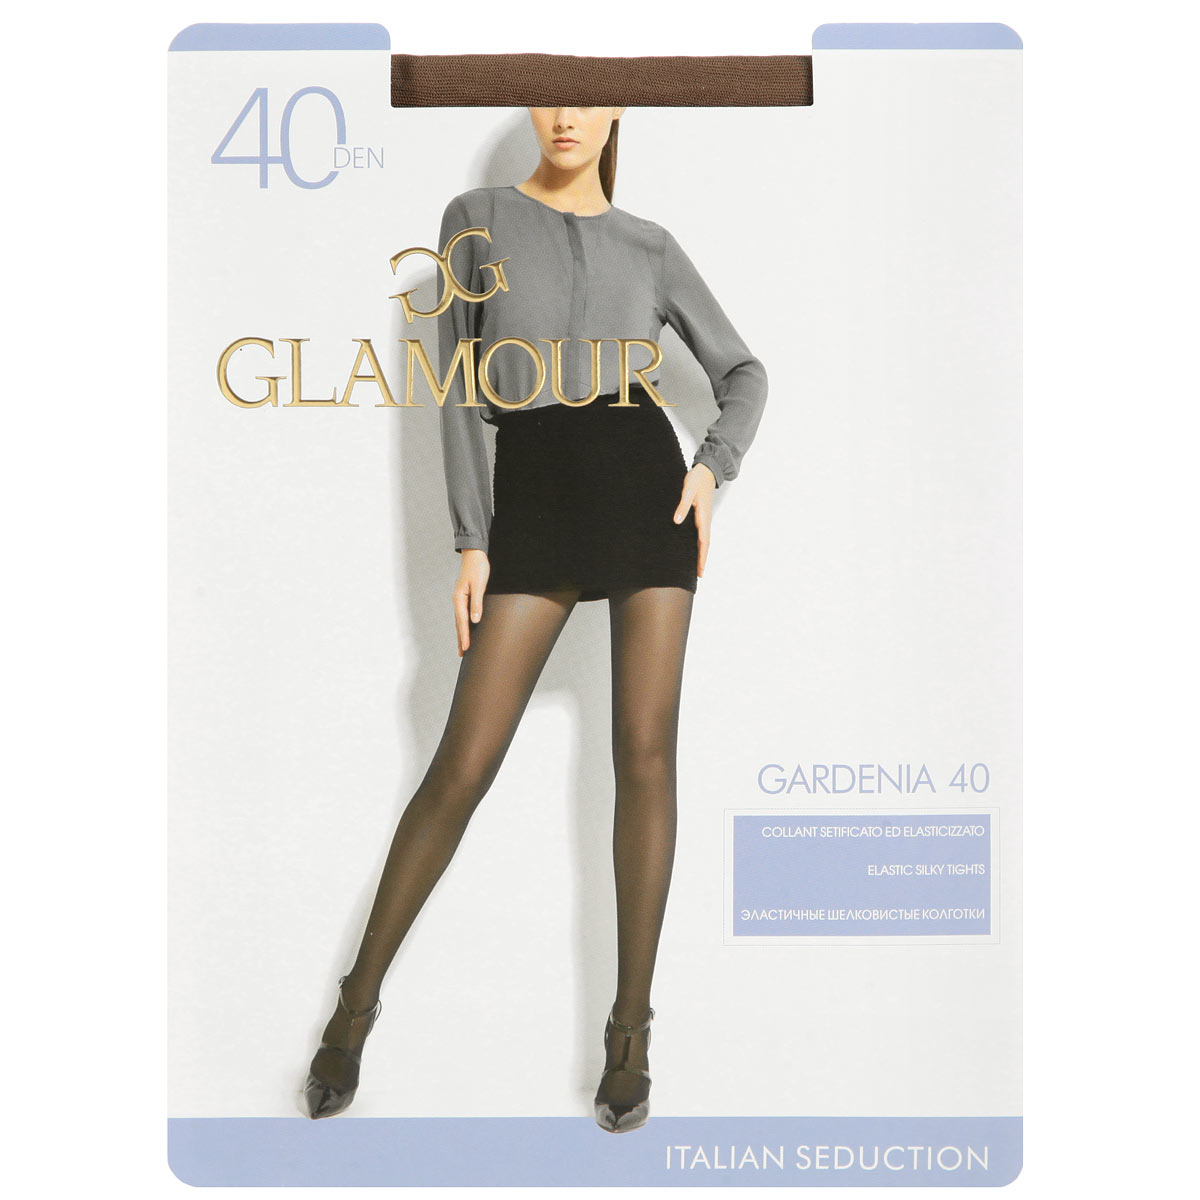 Колготки женские Glamour Gardenia 40, цвет: Daino (загар). Размер 4 (L) колготки sisi mia размер 4 плотность 40 den daino